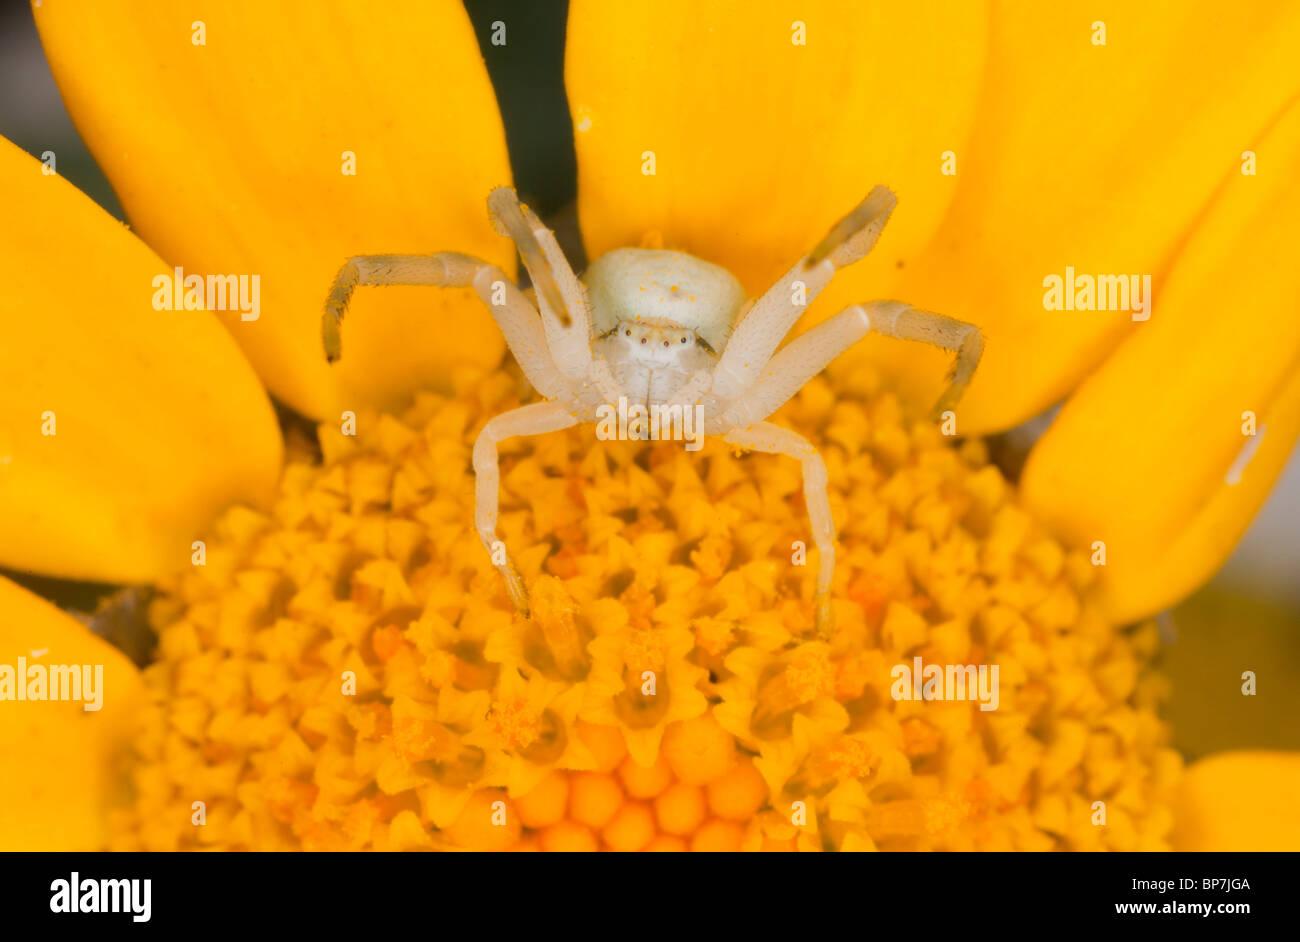 Crab spider preying bumble bee garden spiders spiders flower spiders - Crab Spider Or Flower Spider Misumena Vatia On Corn Marigold Flower Stock Image